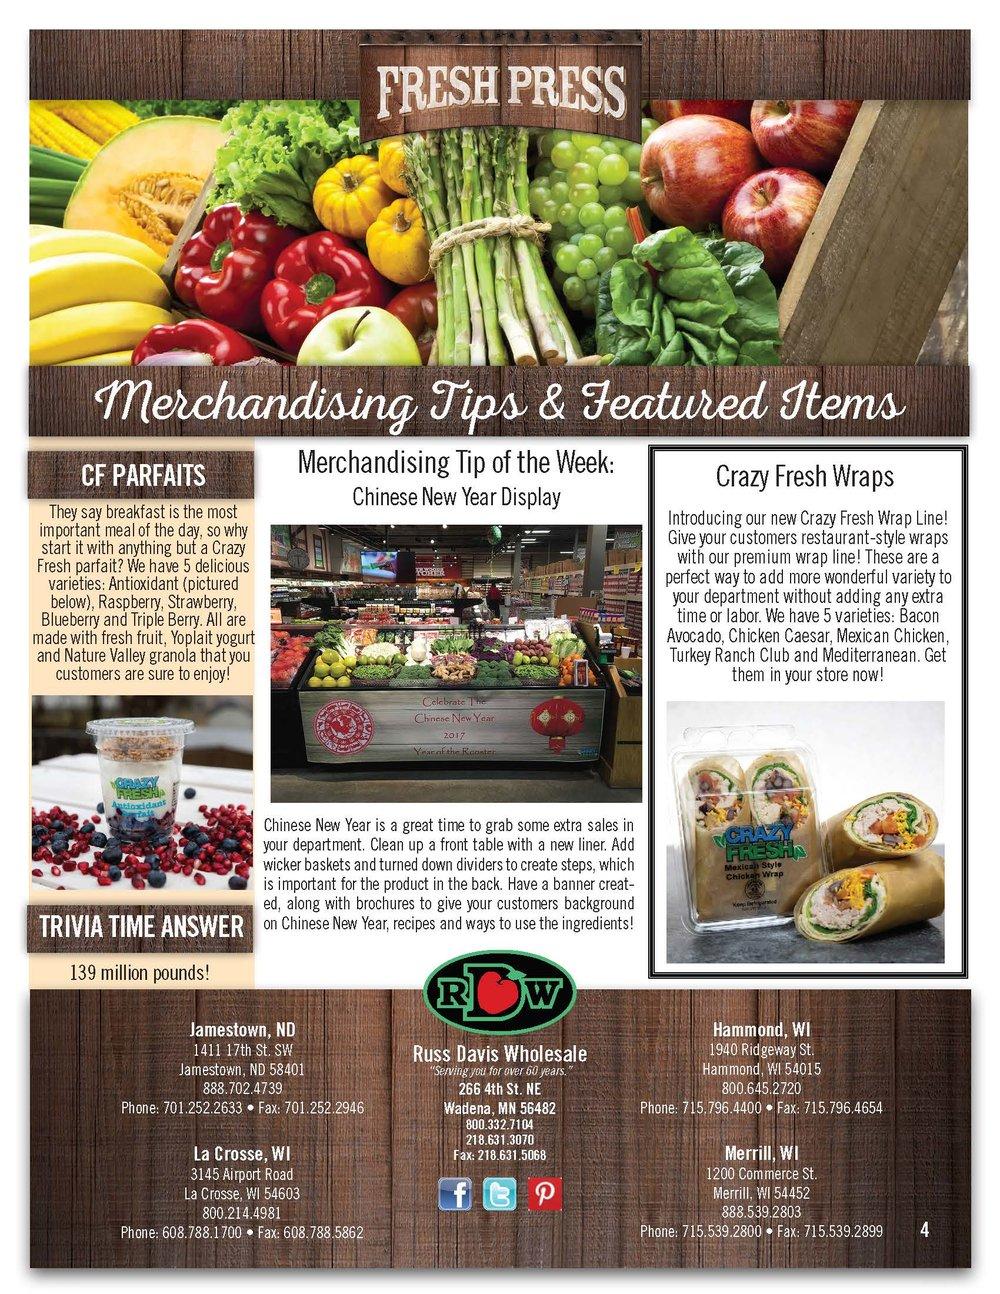 RDW_Fresh_Press_Jan16_2019_Page_4.jpg